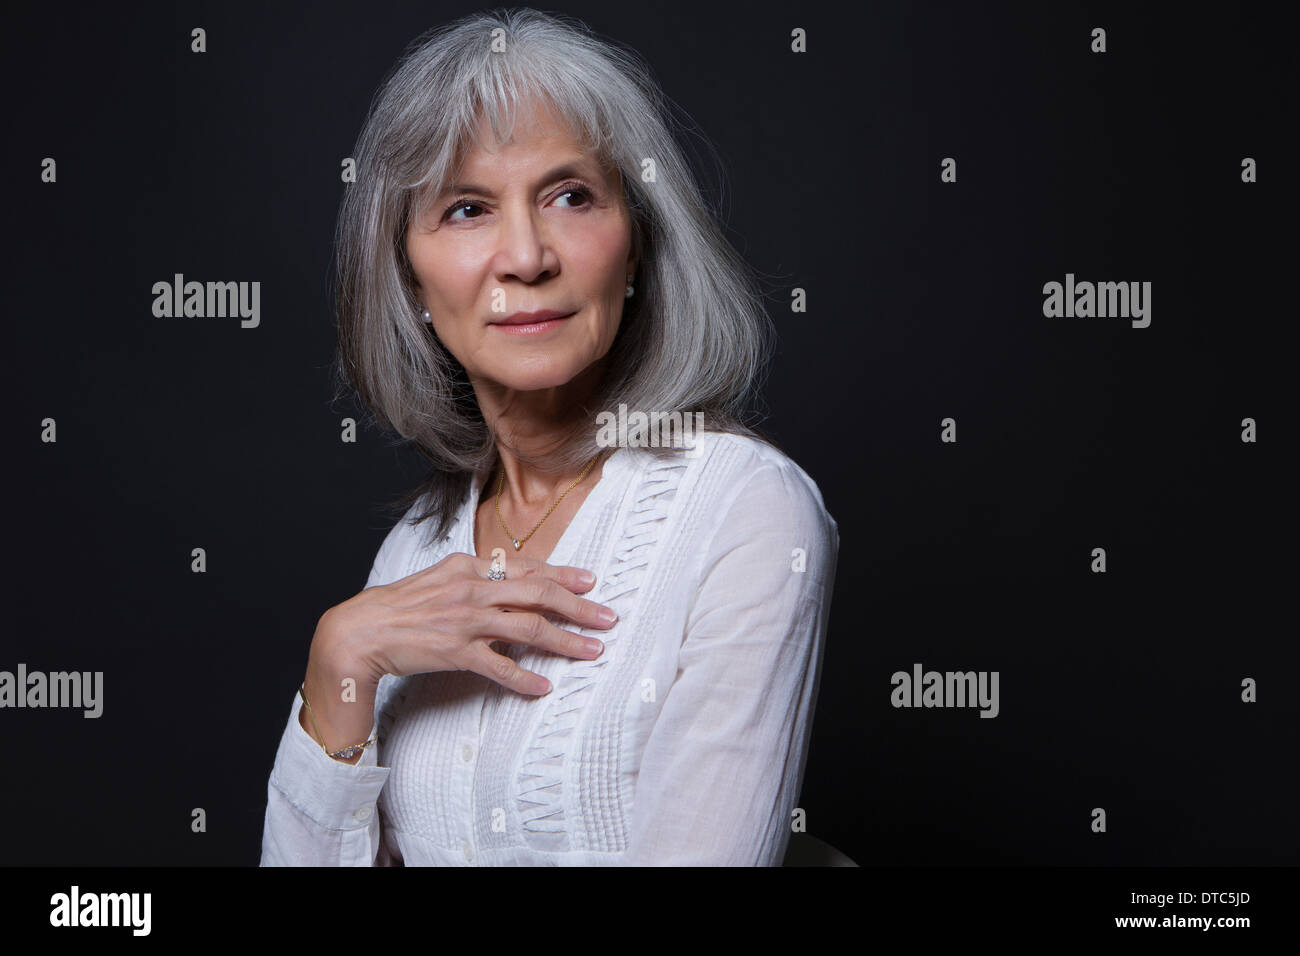 Studio-Porträt der selbstbewusste ältere Frau Stockfoto